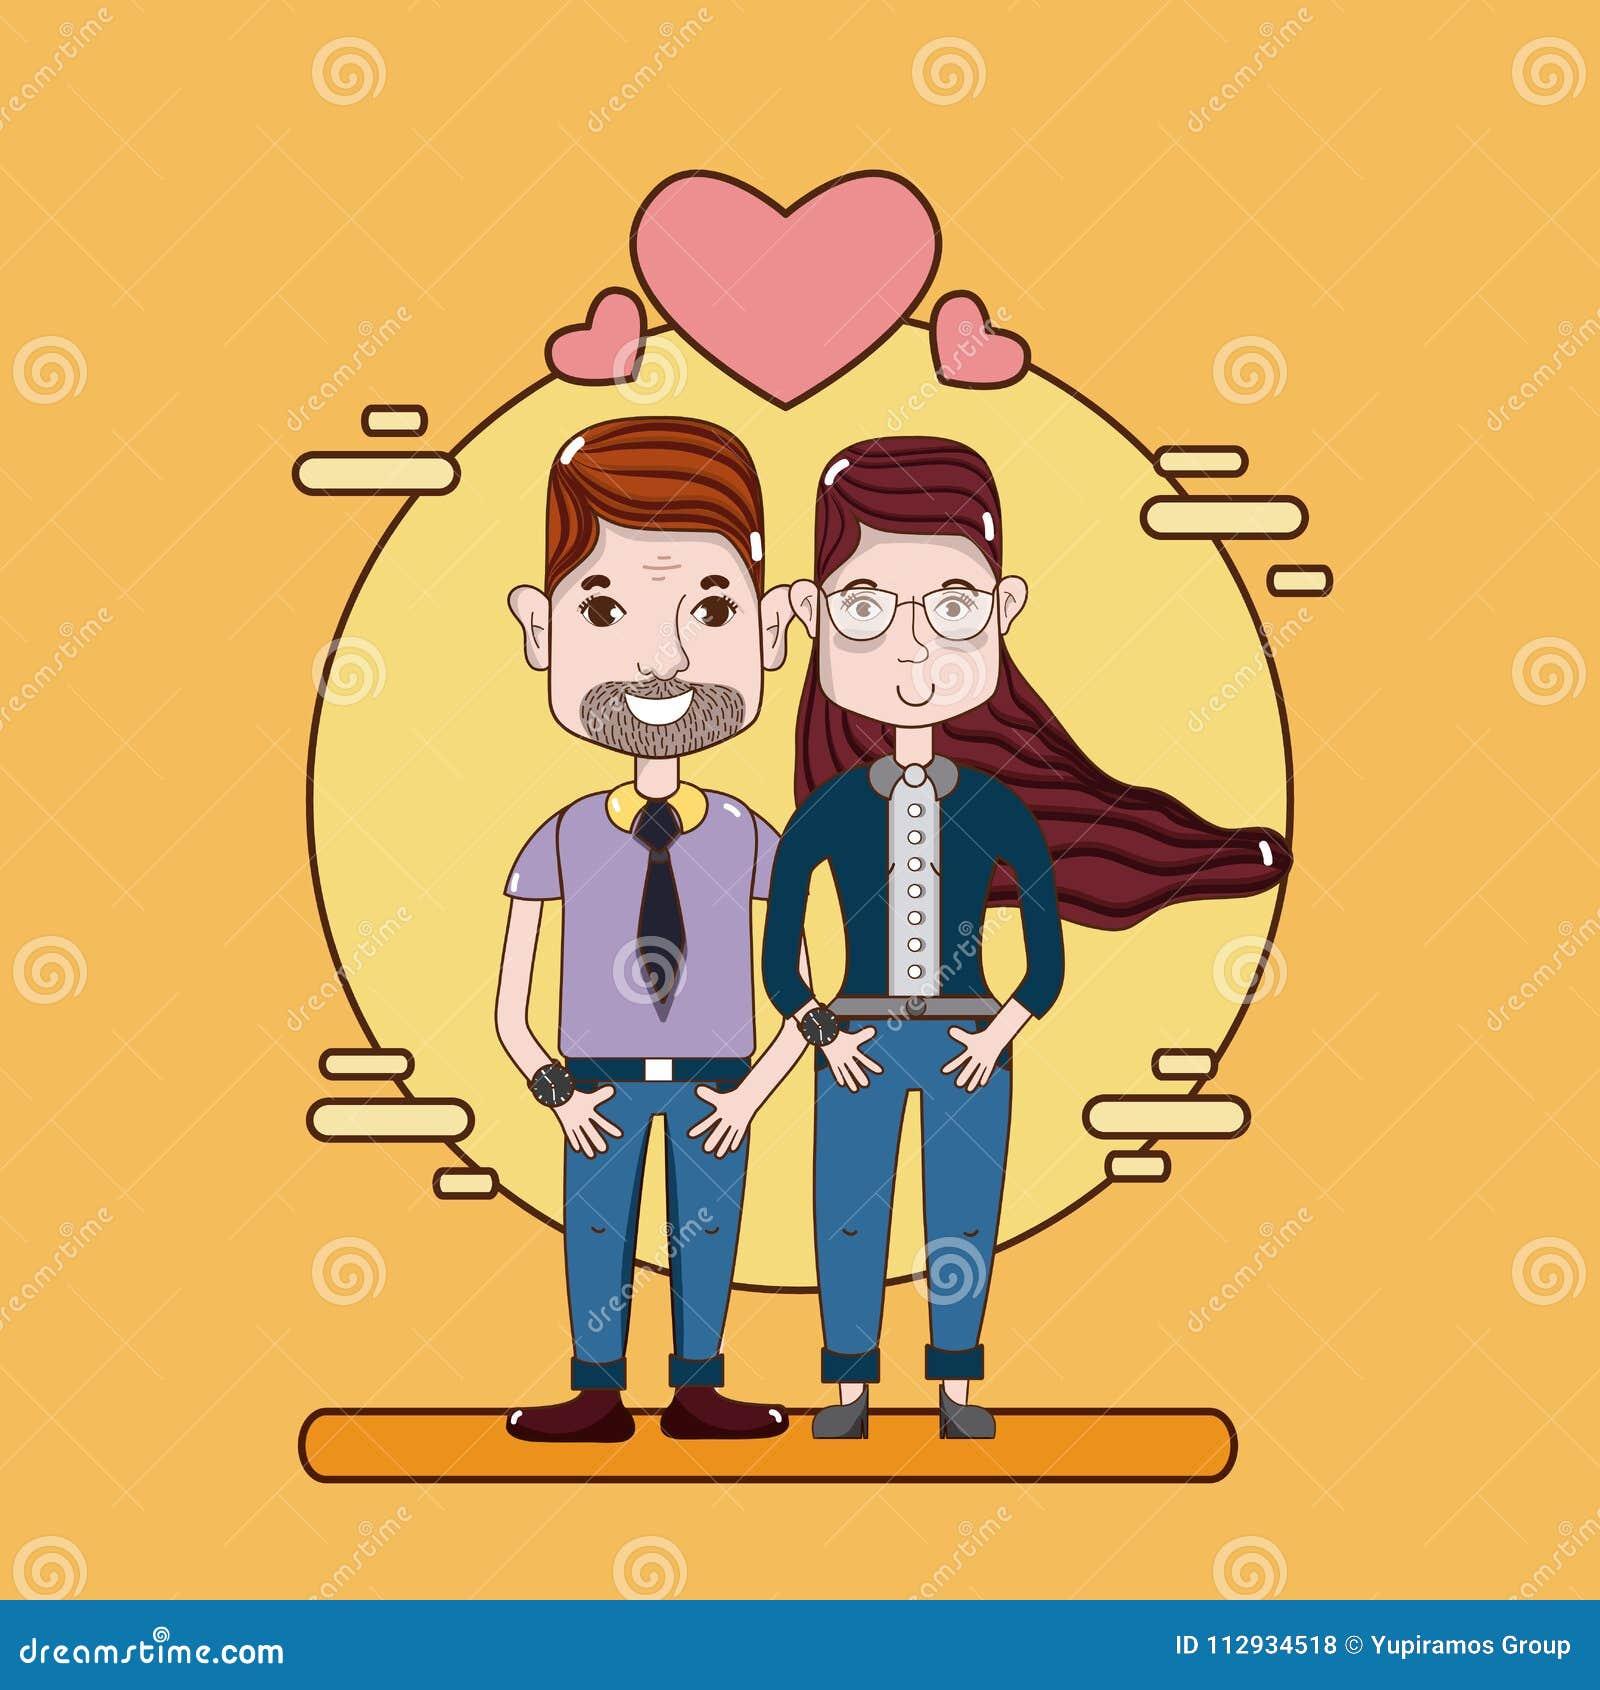 funny couple cartoons